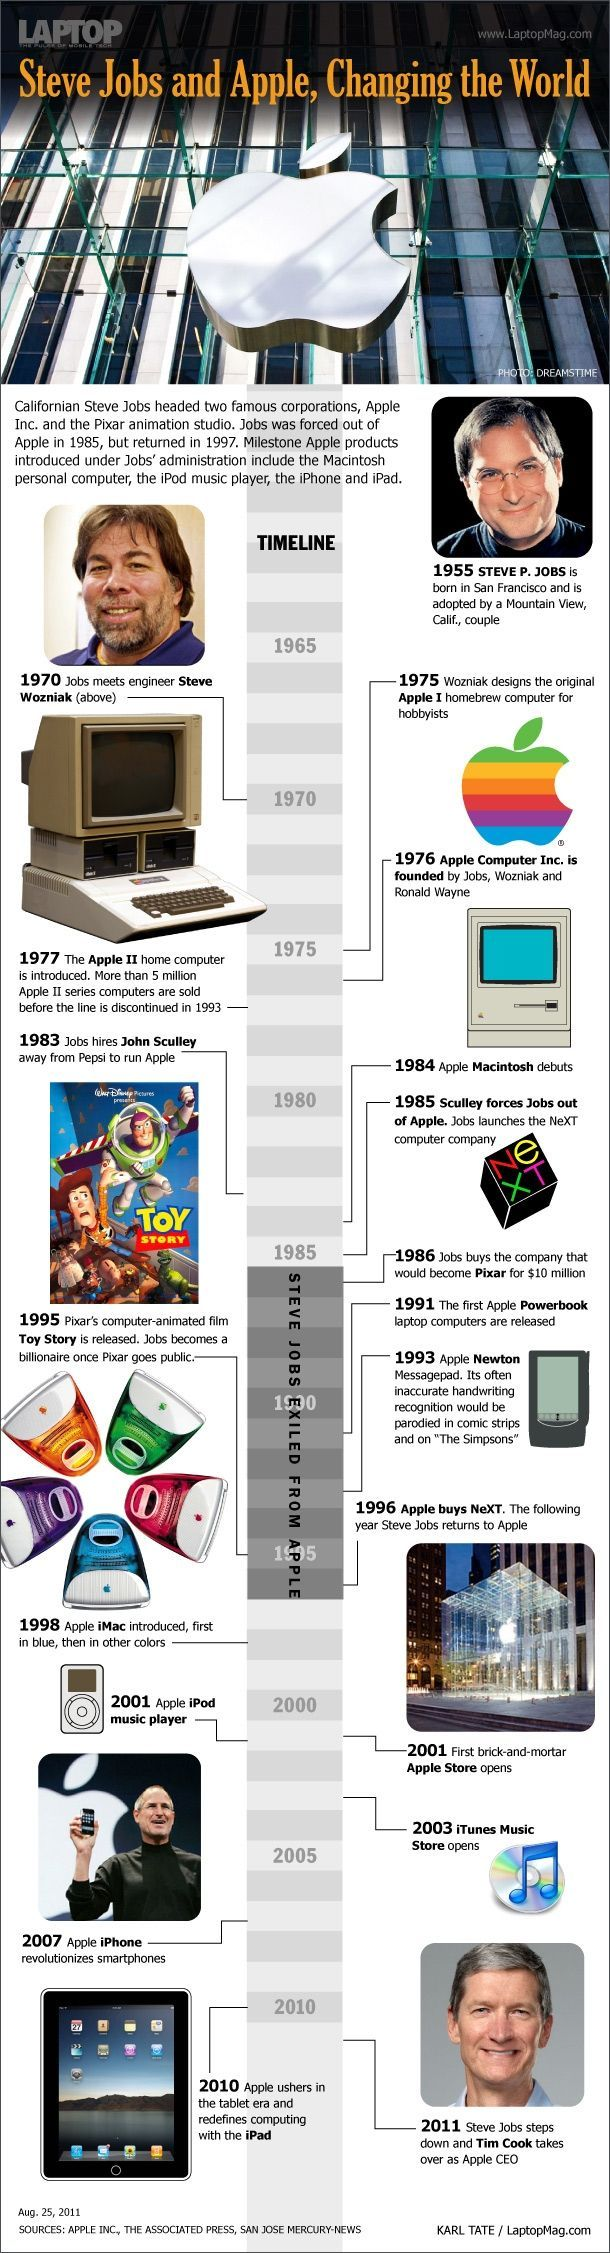 Apple, Steve Jobs, Changing The World